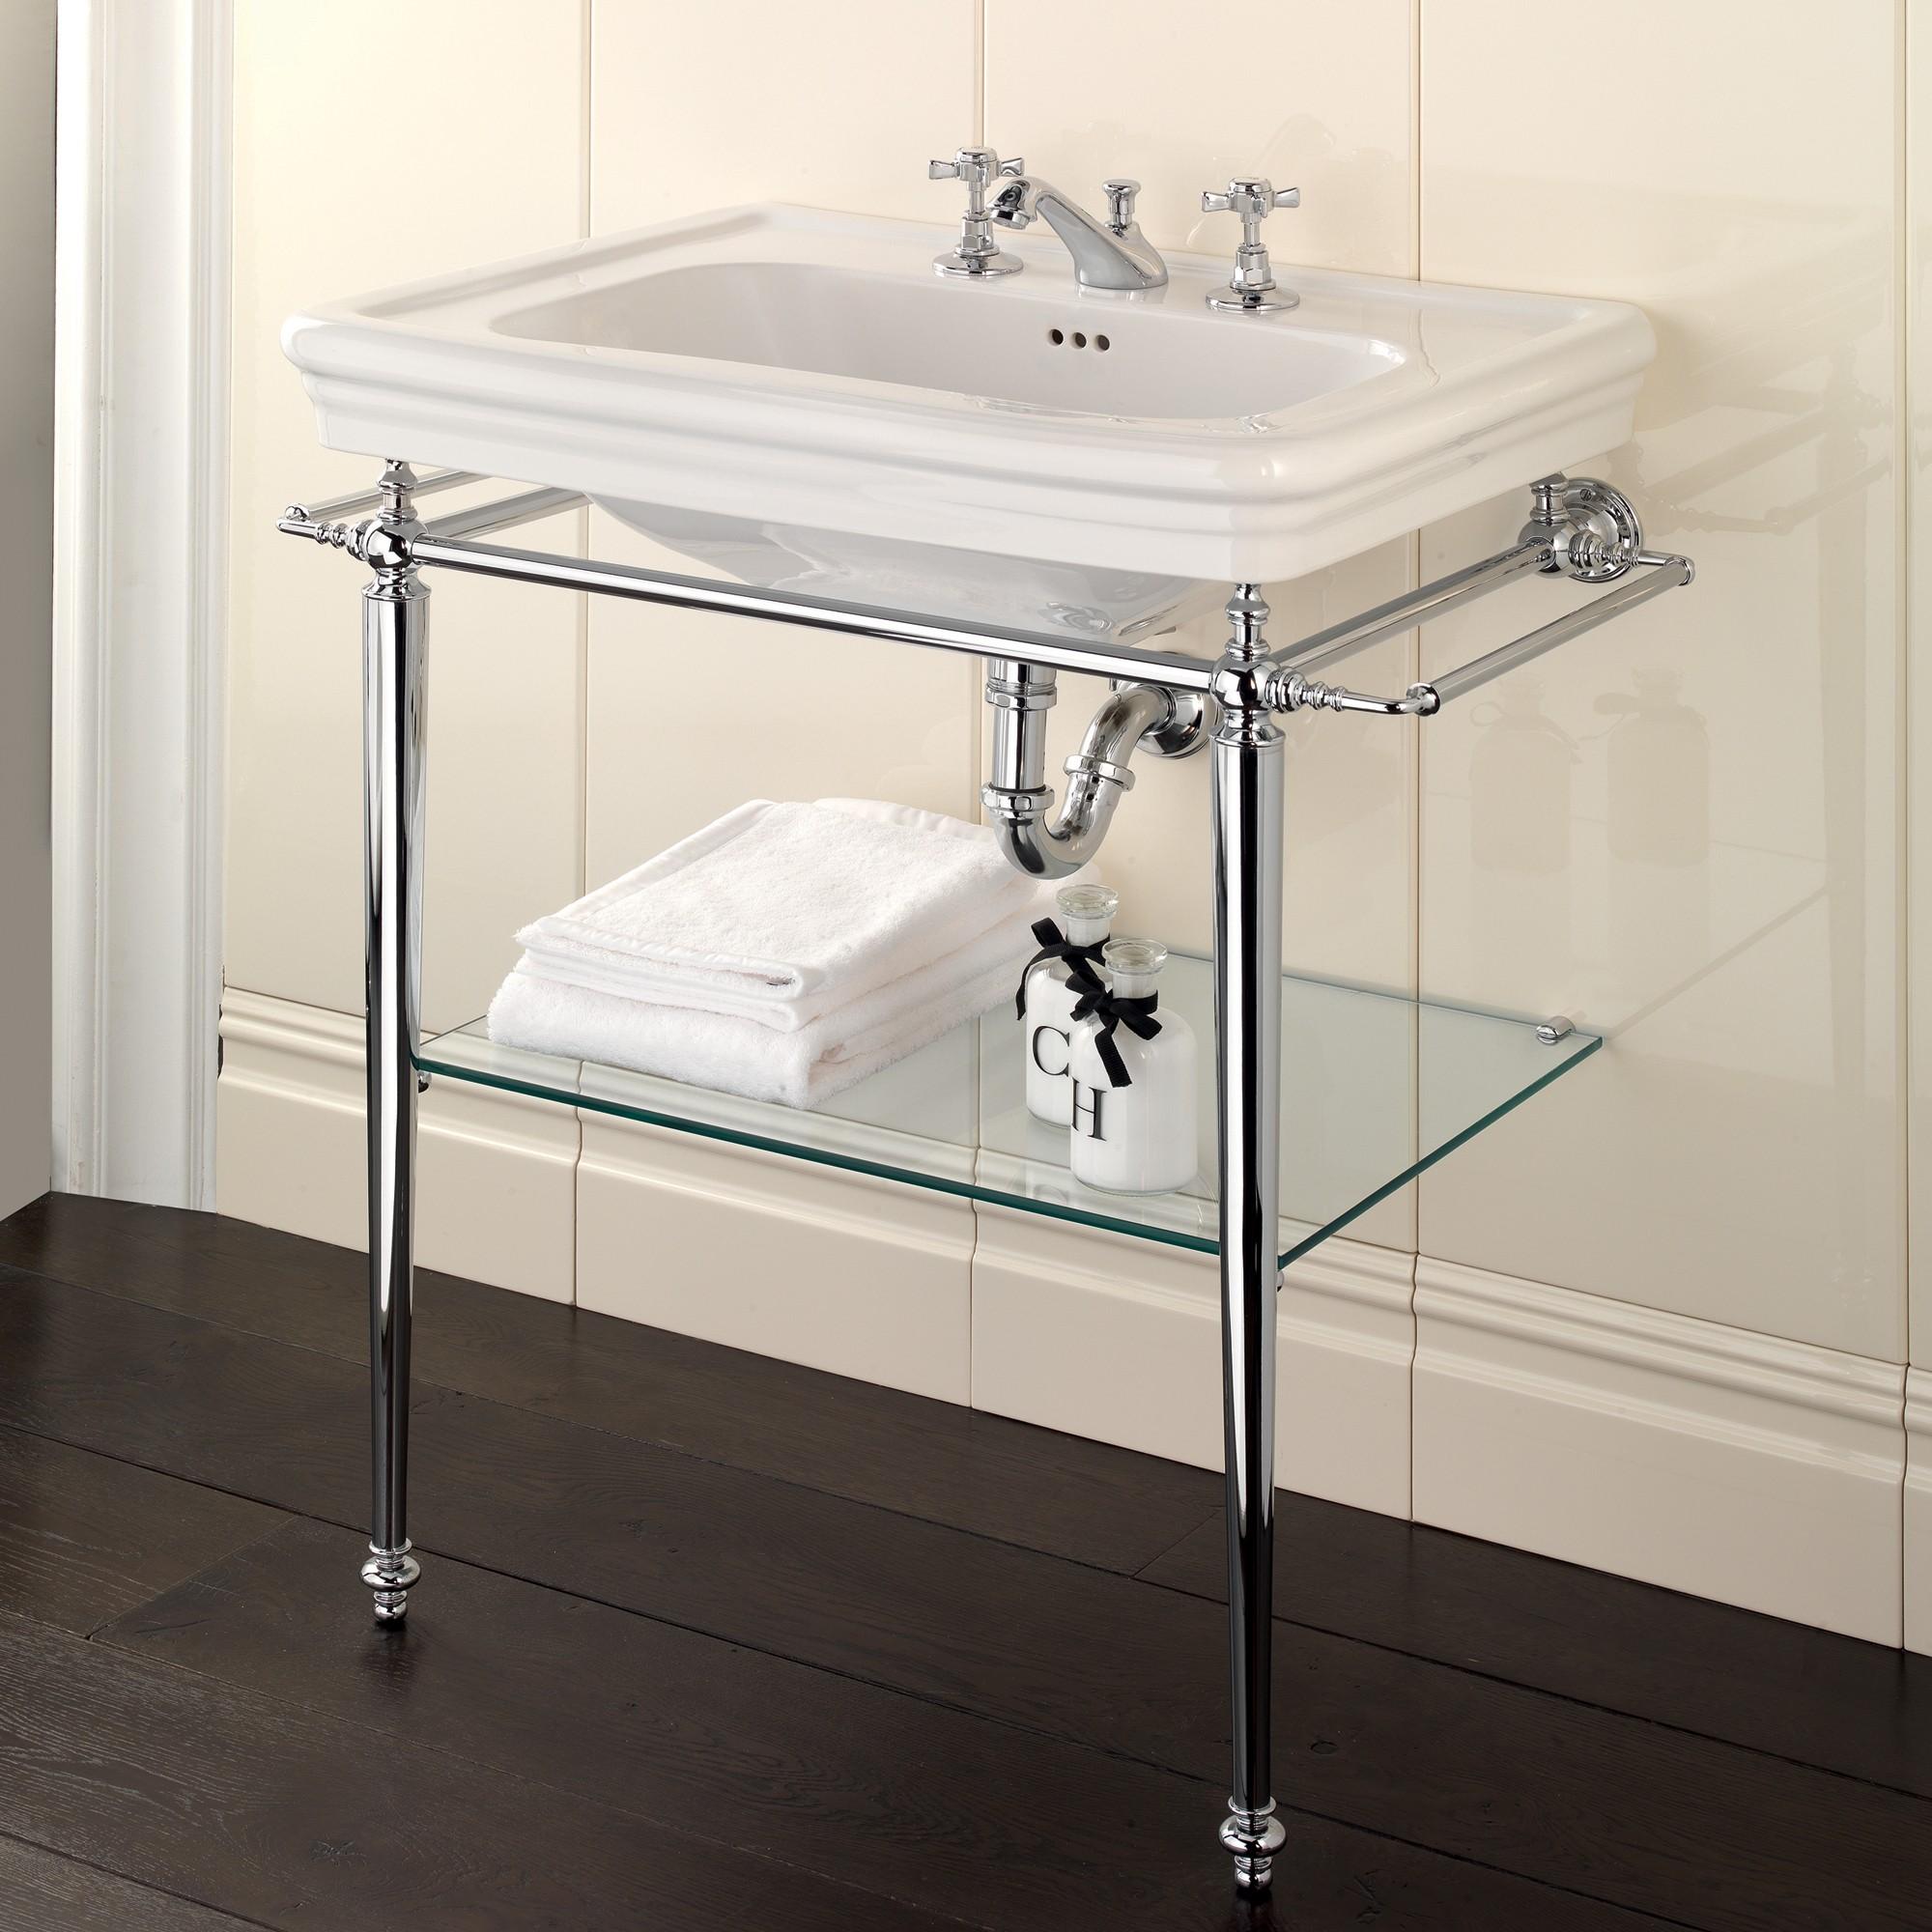 Ordinaire Bathroom Sink Console Table